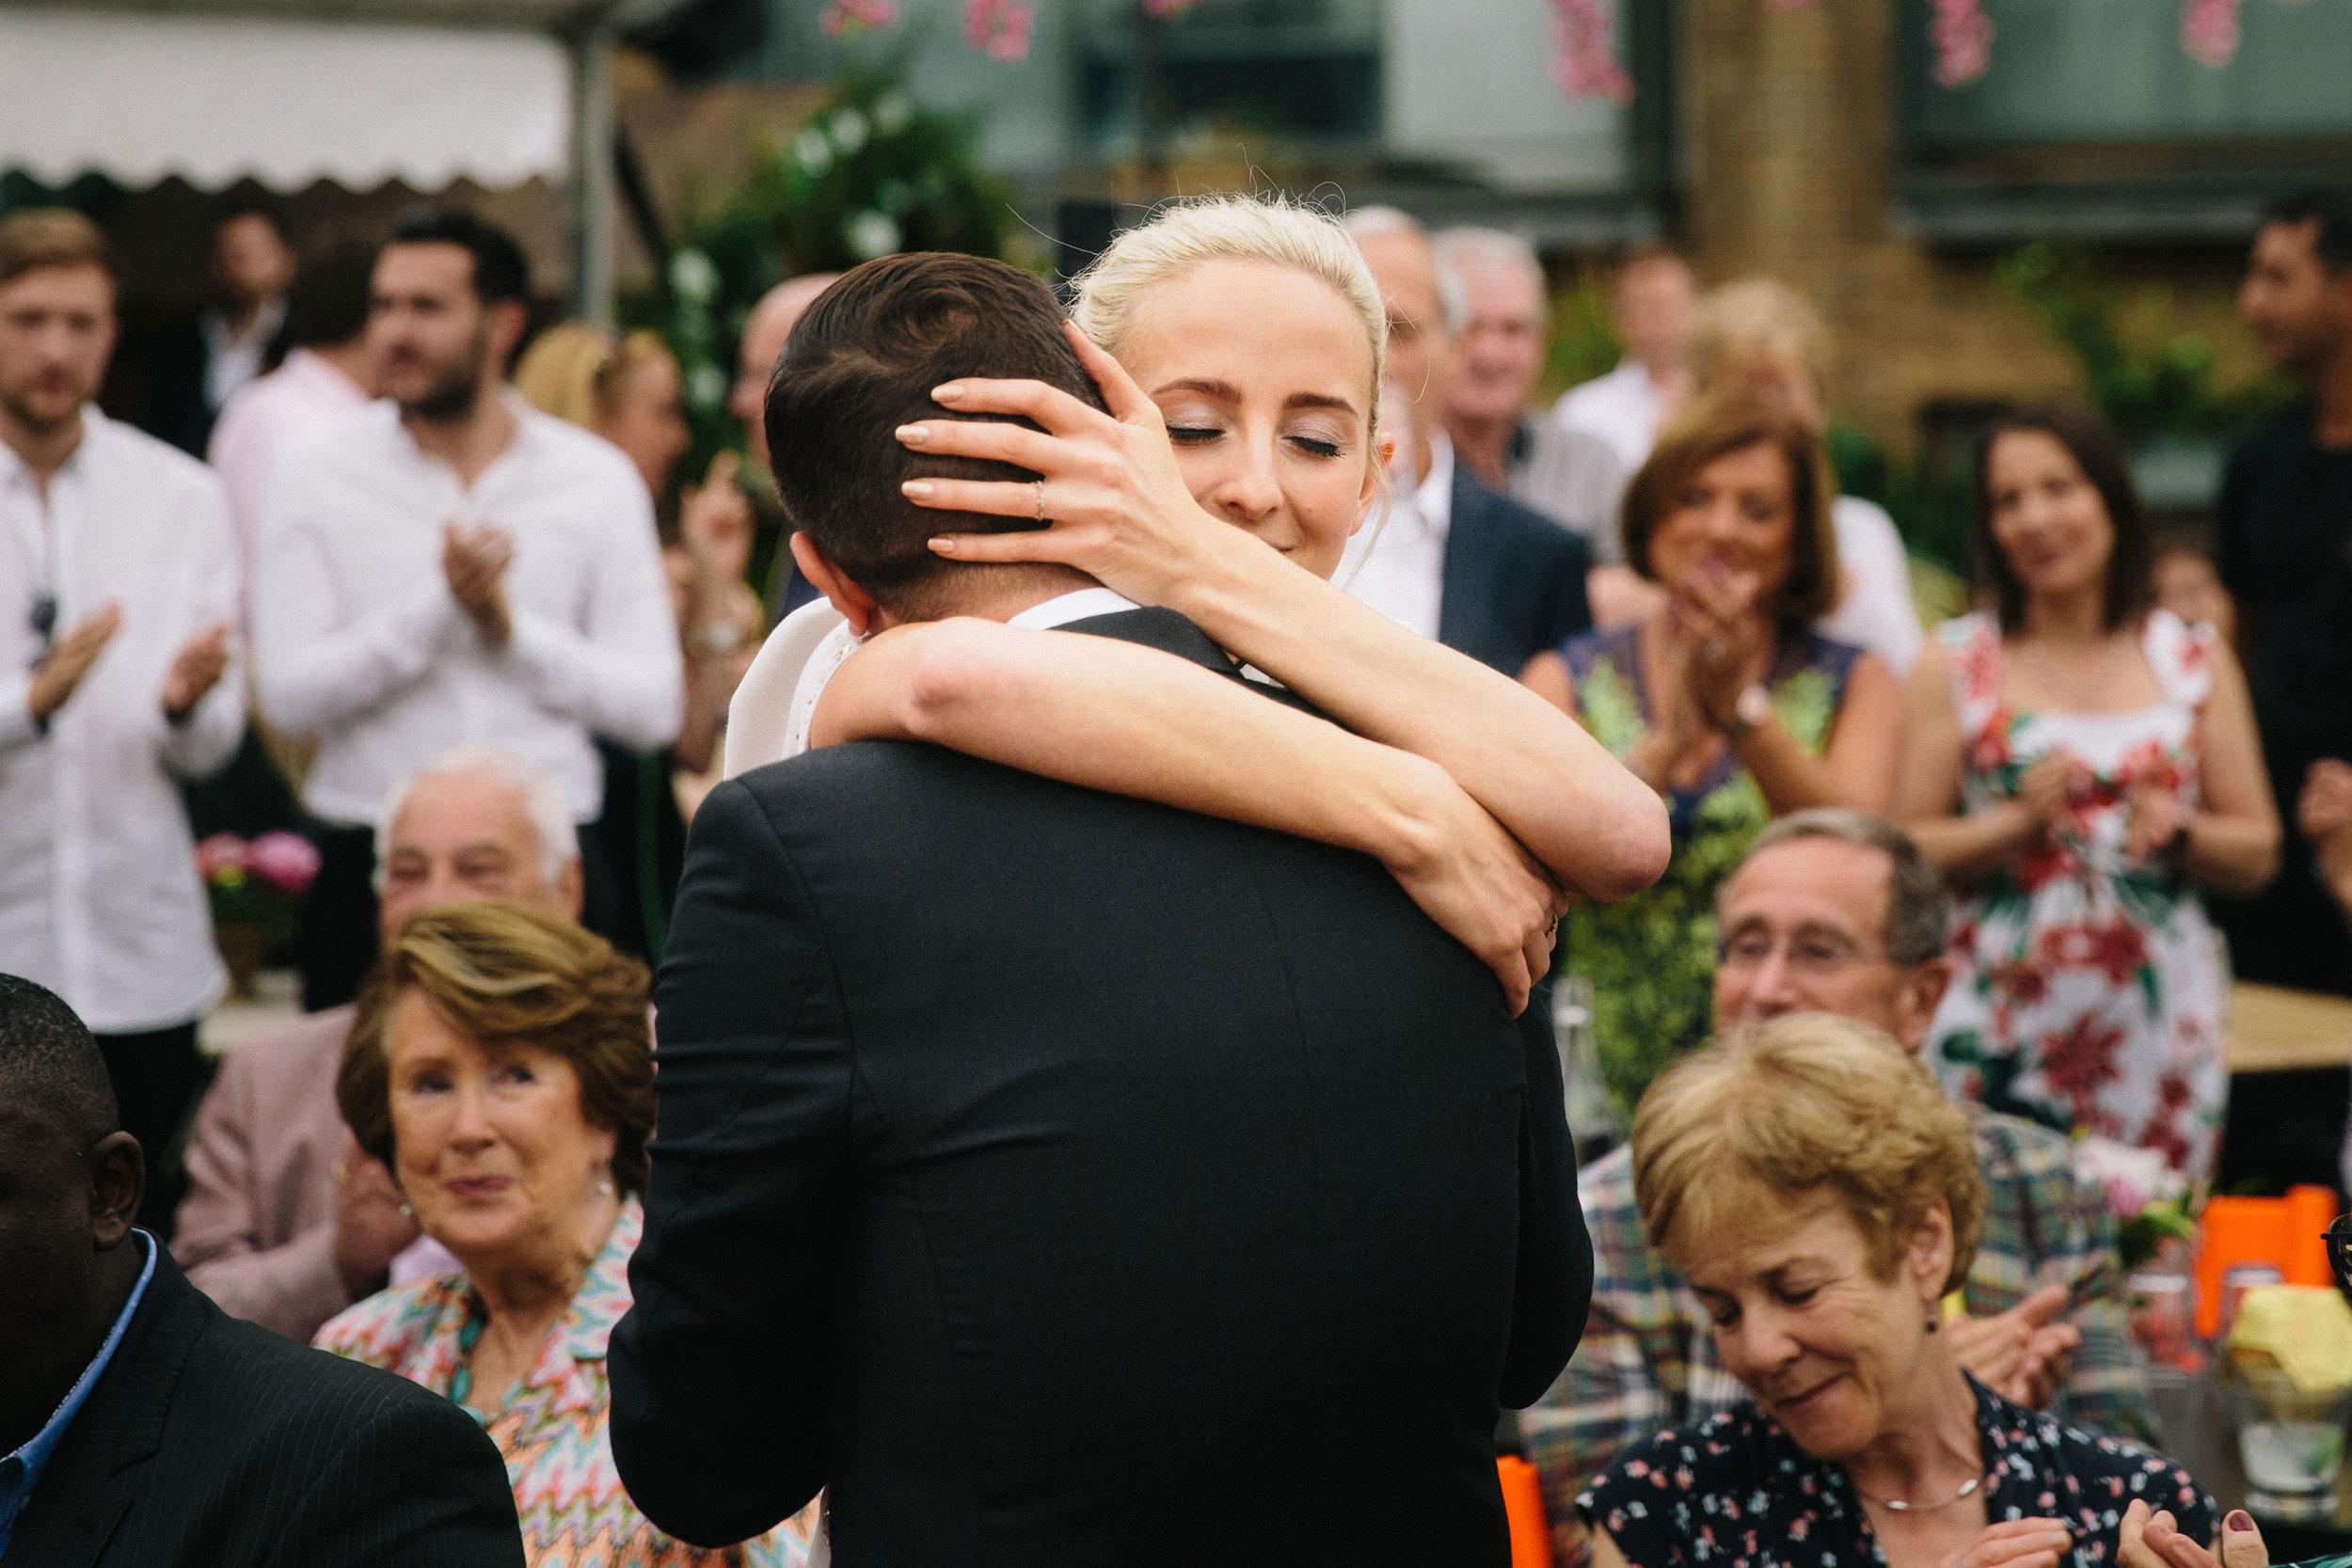 West-London-wedding-party-in-Ladbroke-Grove-Michael-Newington-Gray-50.jpg